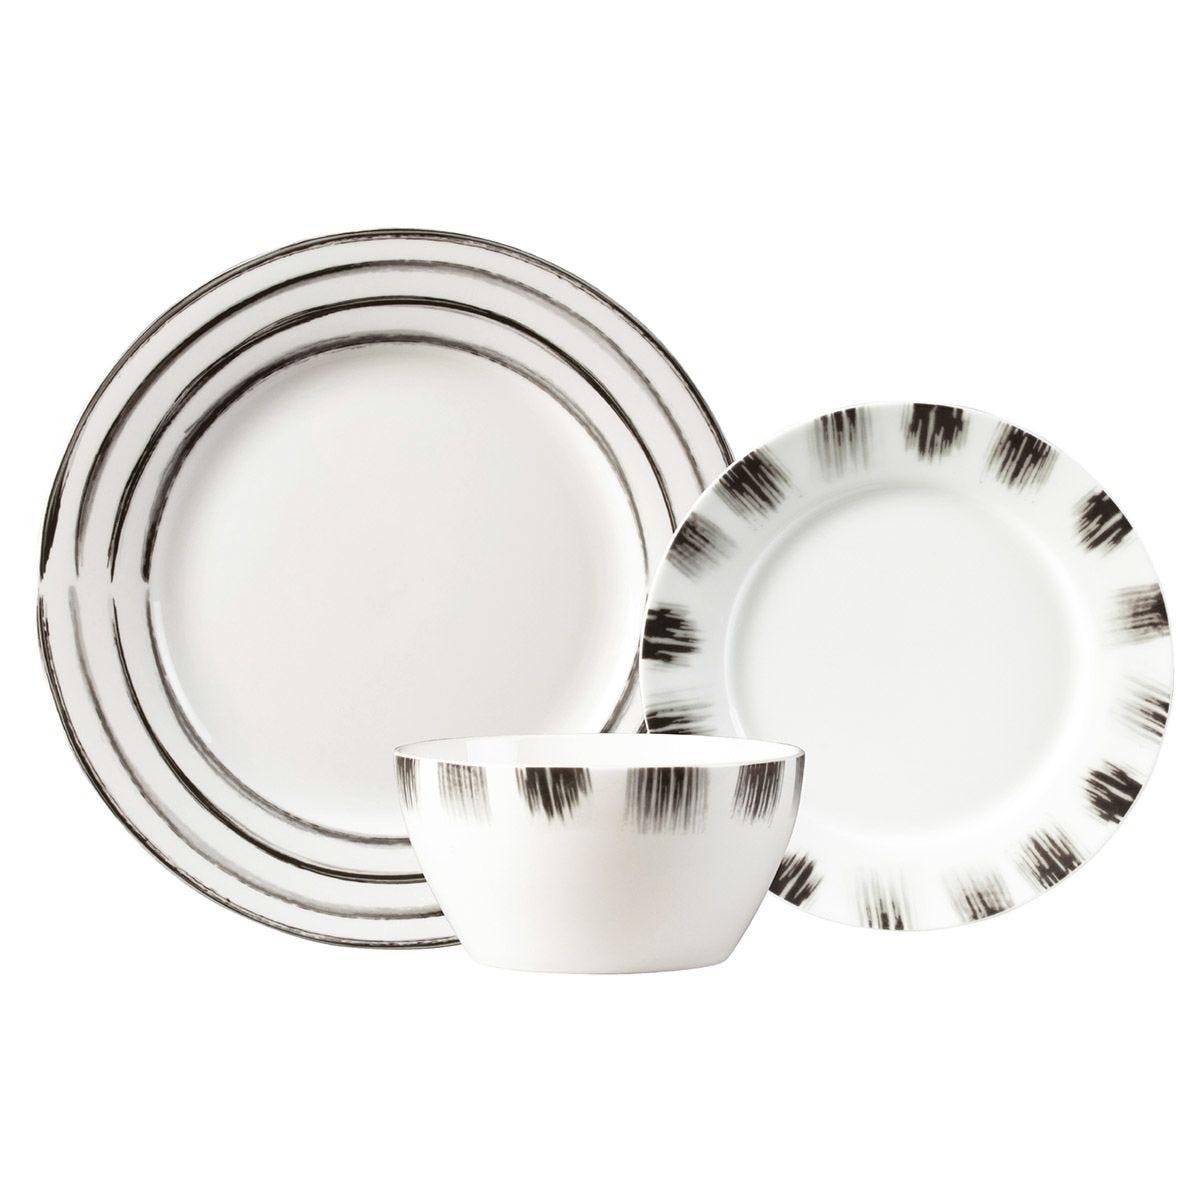 Carnaby Shoreditch 12-Piece Porcelain Dinner Set